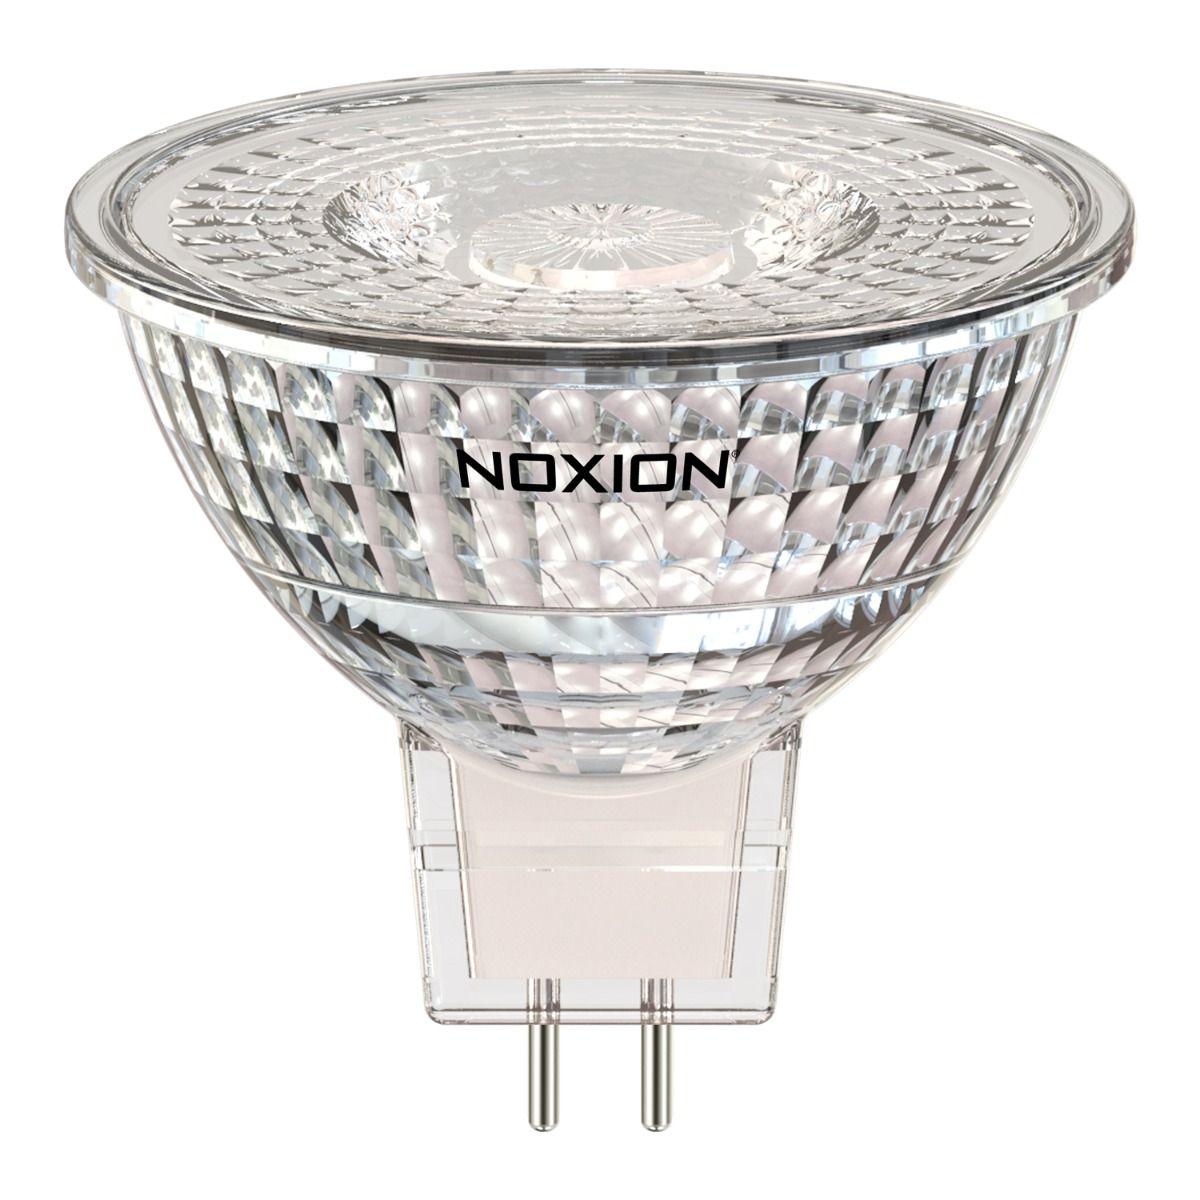 Noxion LED spot GU5.3 5W 830 36D 470lm   dimbar - varm hvit - erstatter 35W